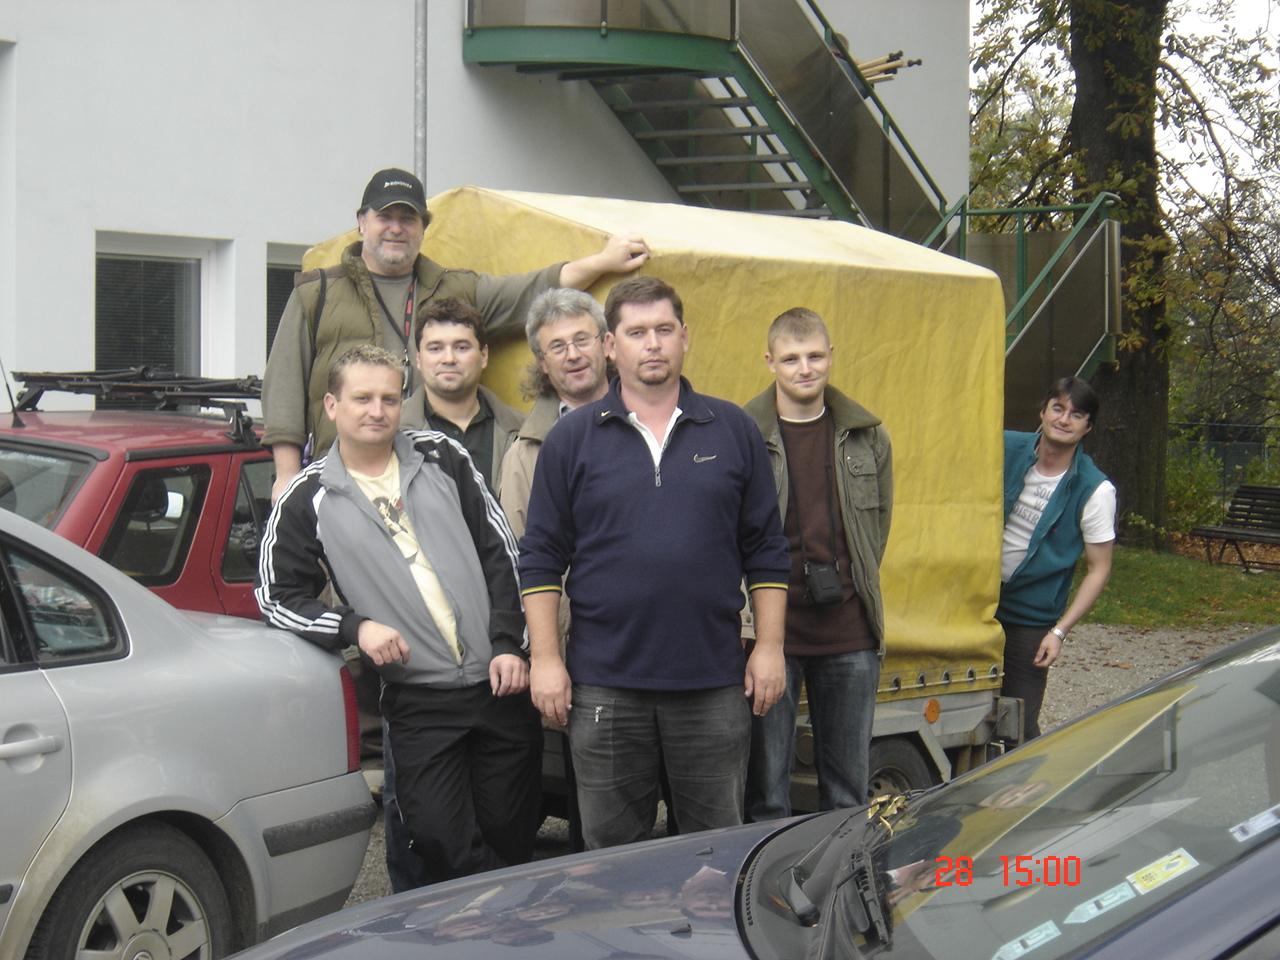 komorni-lhotka-2008-075.jpg